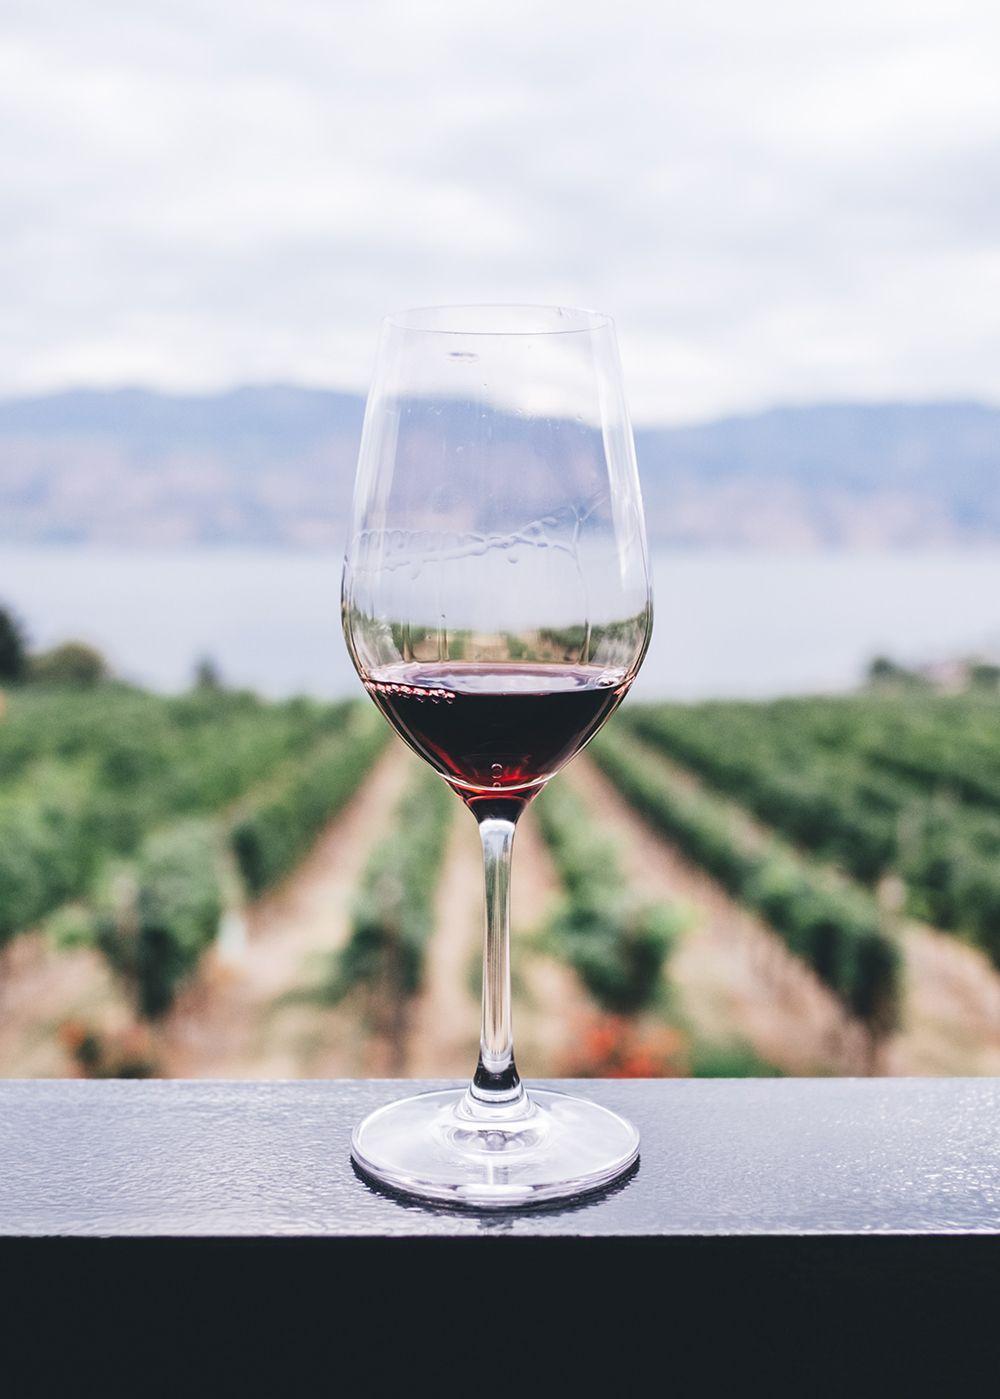 _wine_in_vineyard_kym-ellis-af1npsndqlw-unsplash_edit